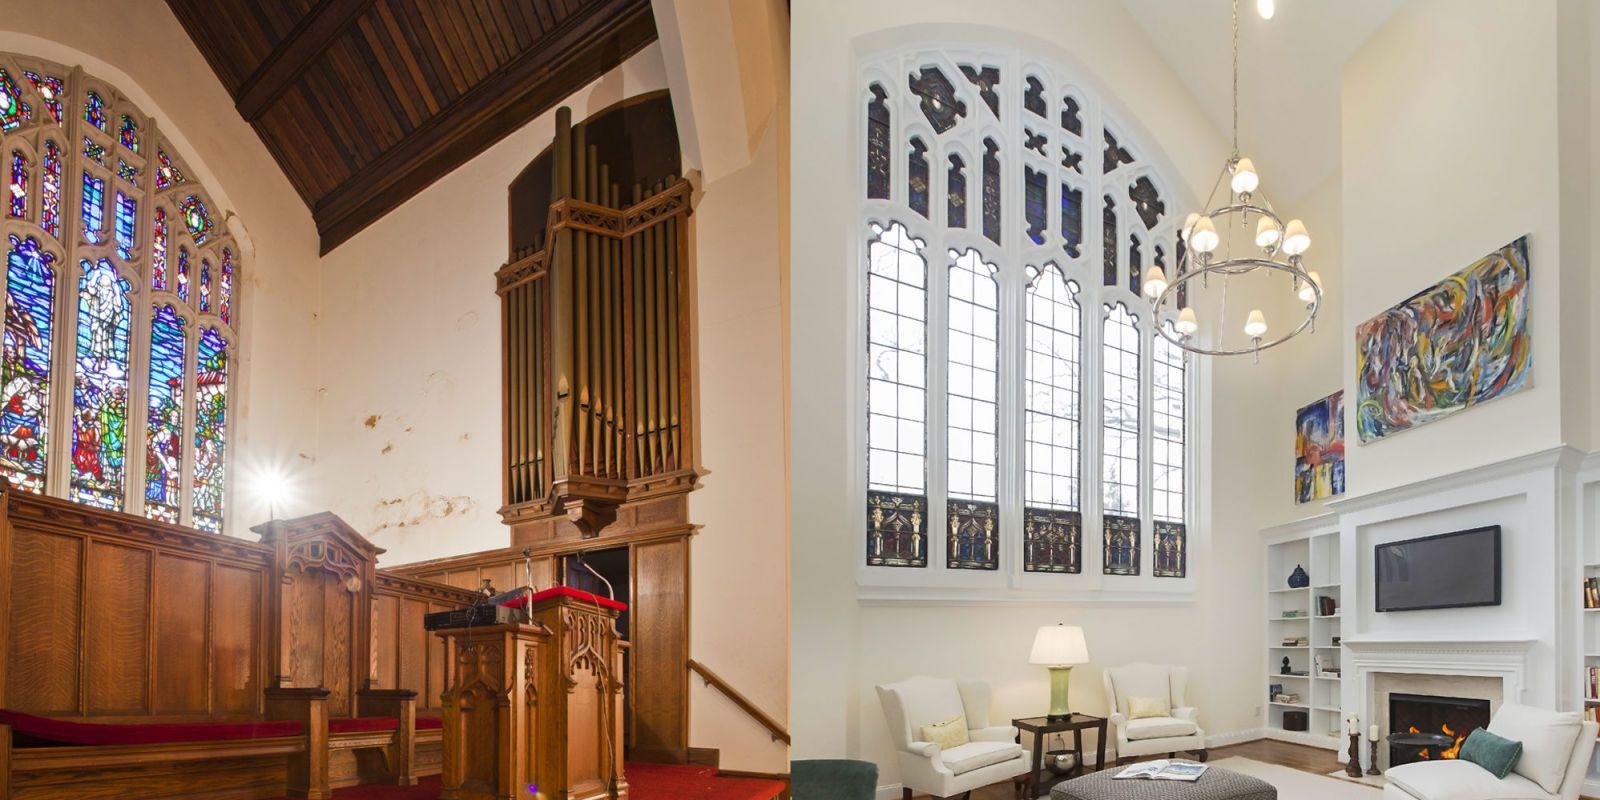 main line rebuild, church, luxury real estate